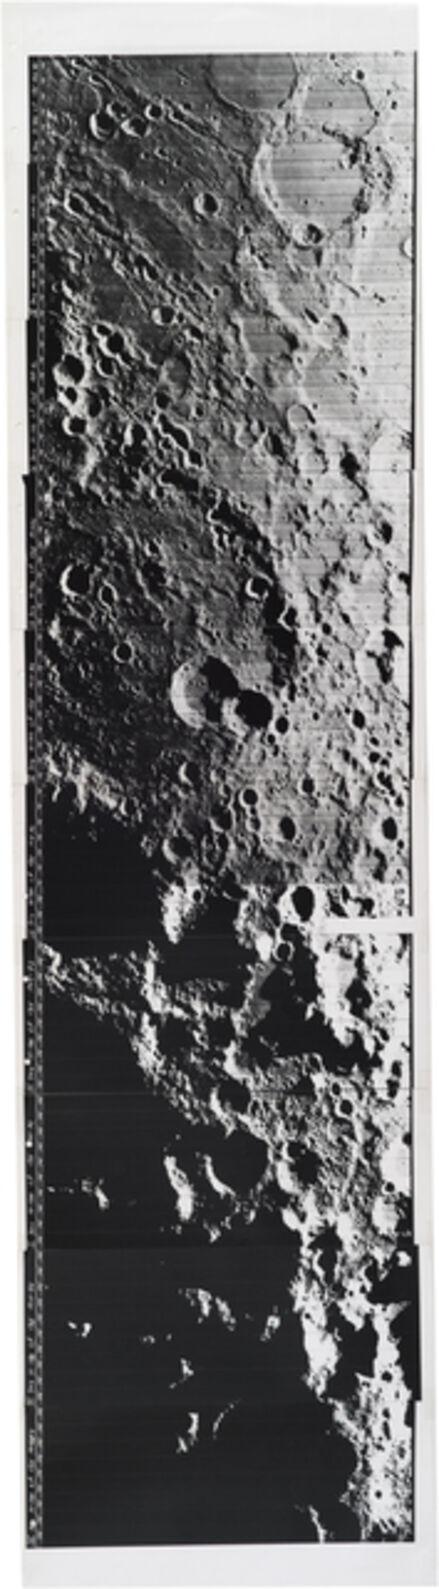 NASA, 'Orbiter 4 · Lunar Surface', 1967